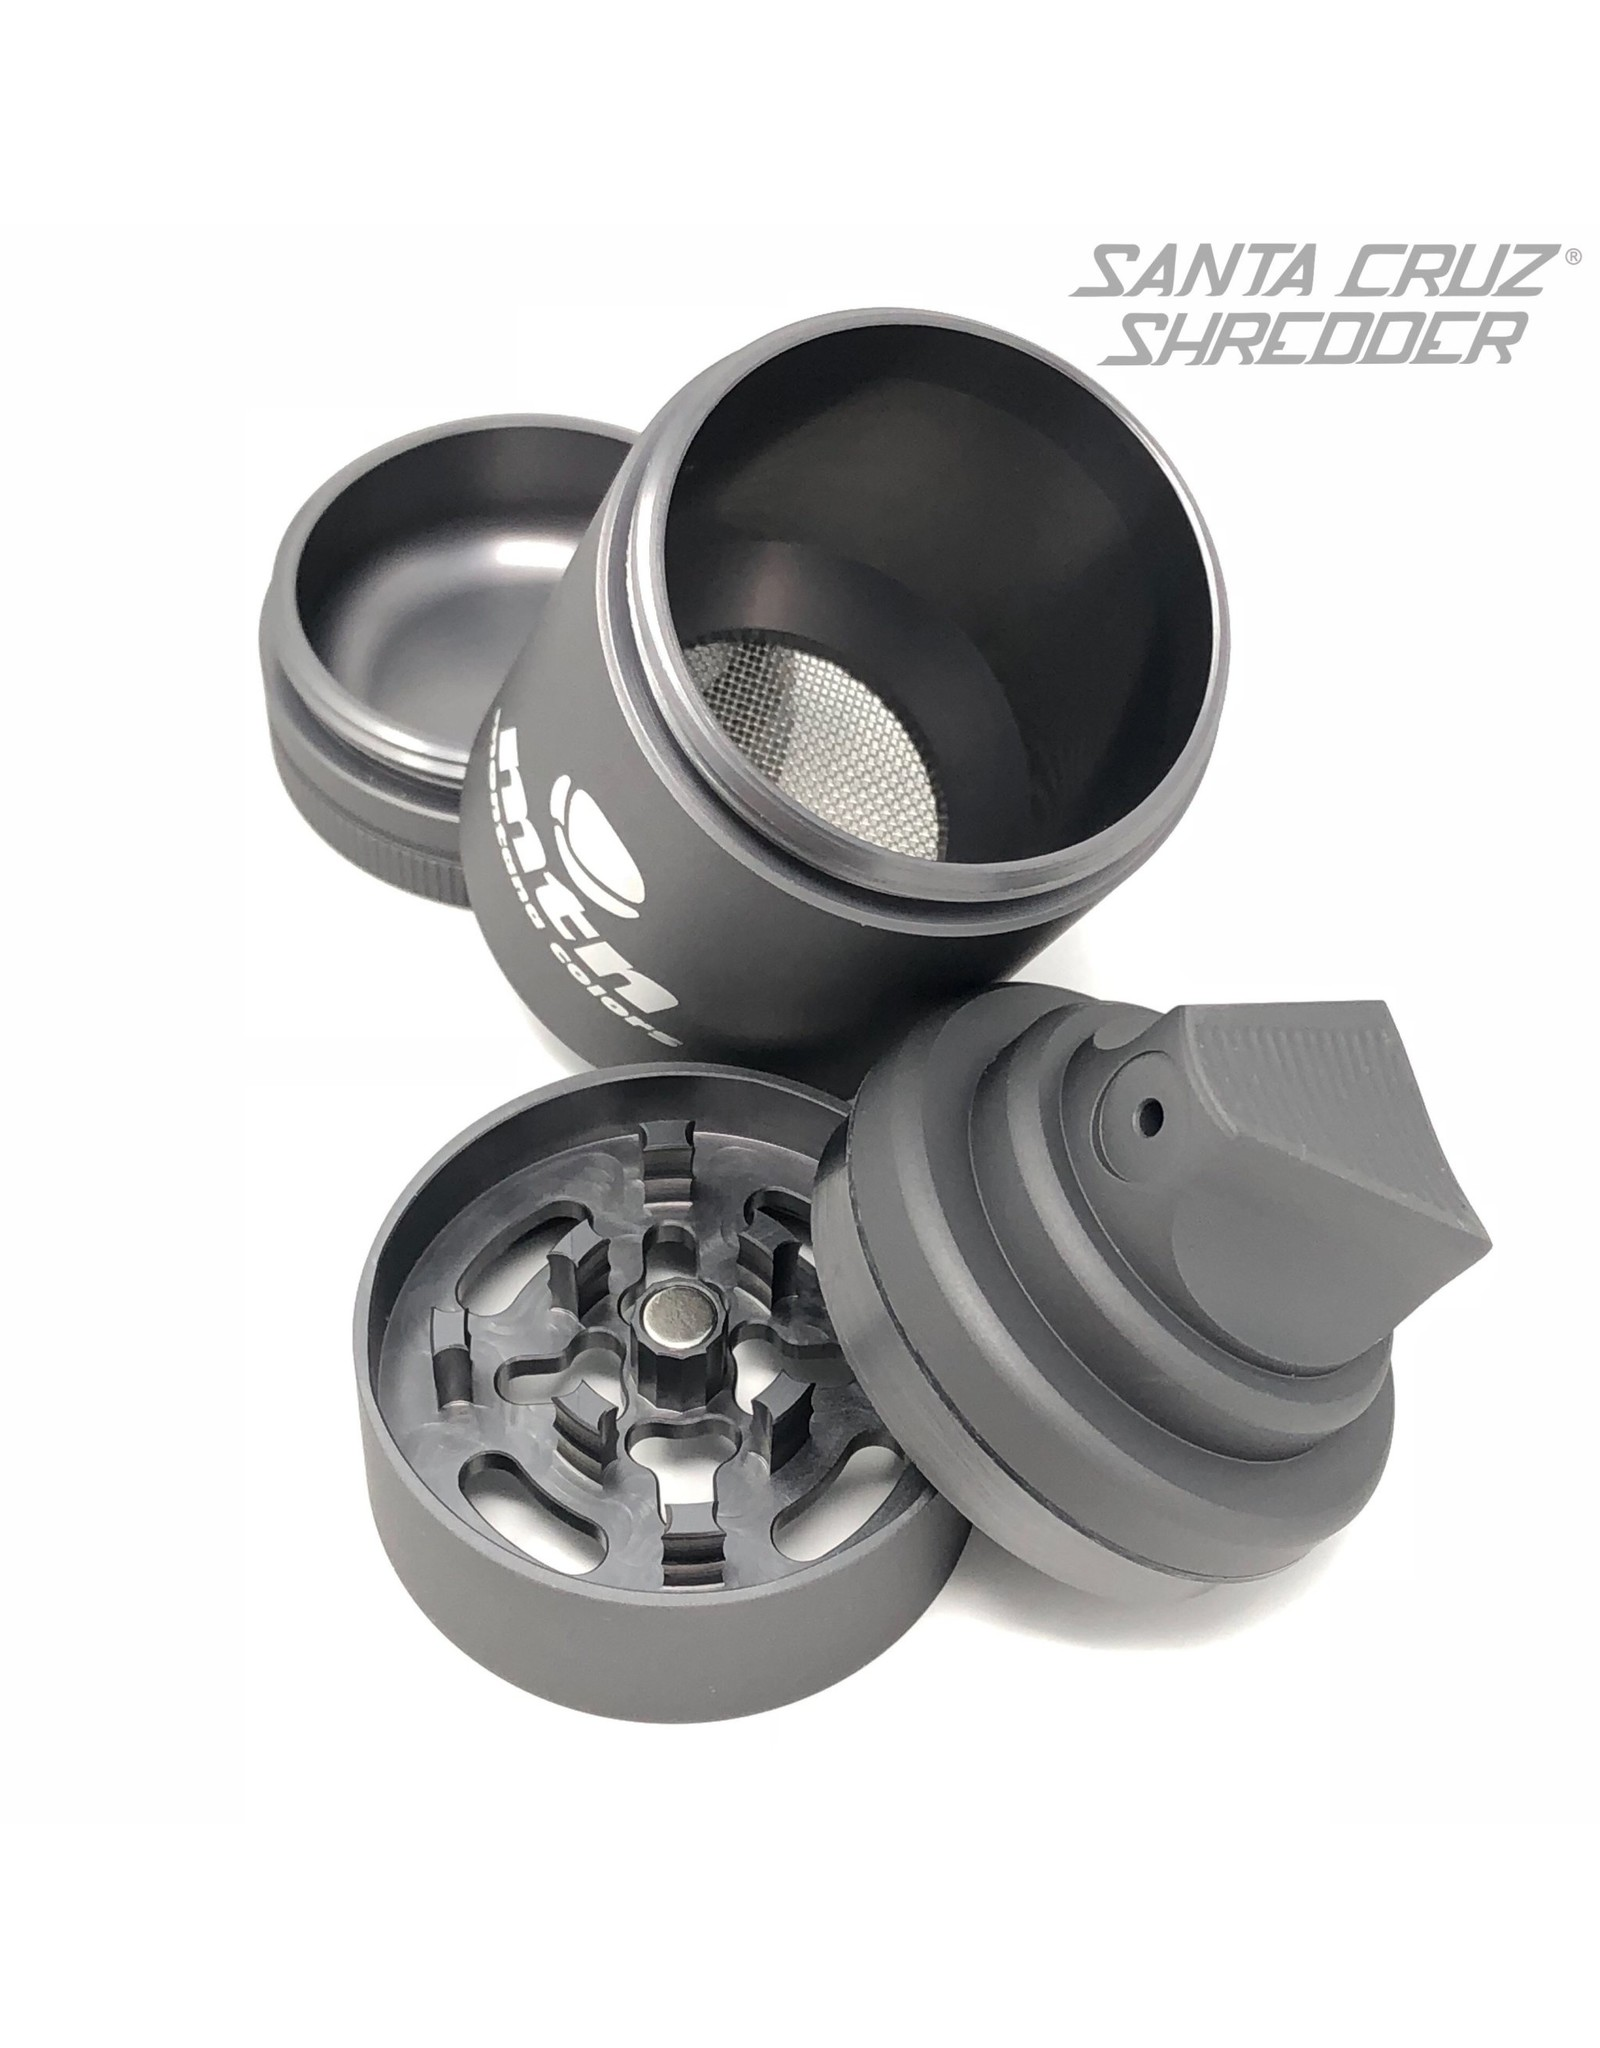 Santa Cruz Shredder Montana Colors 4 Piece Spray Can Shredder Grey